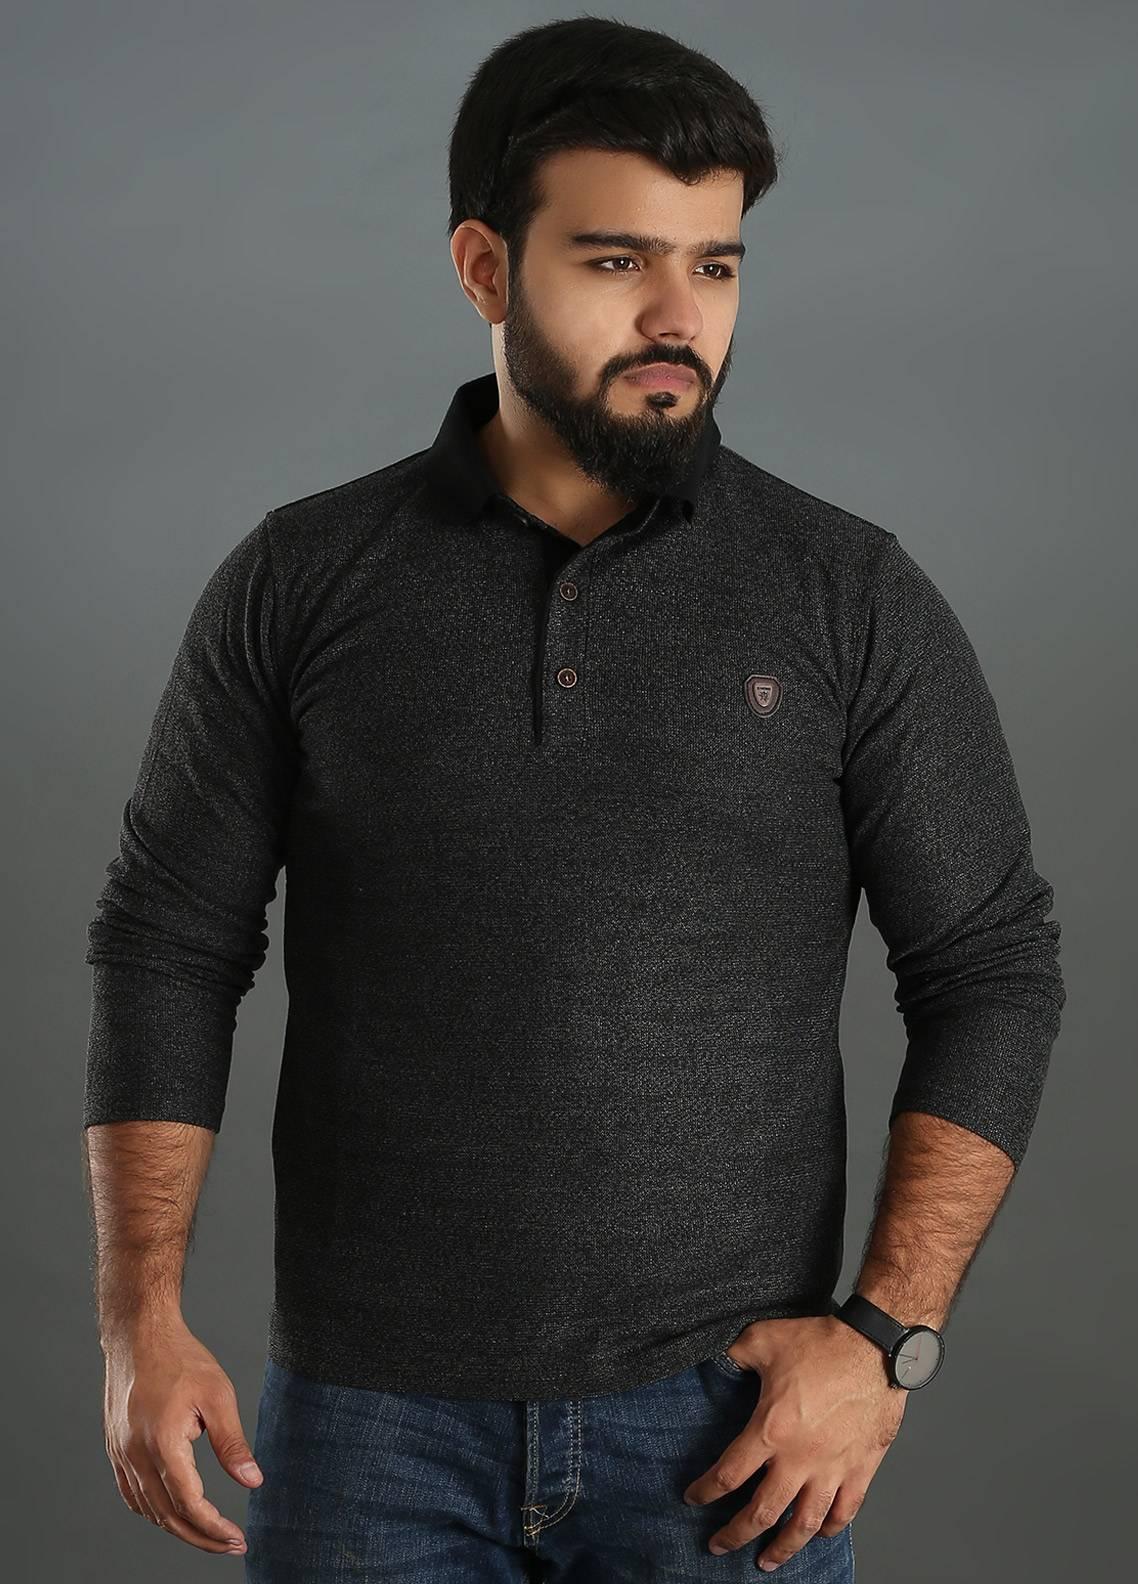 Sanaulla Exclusive Range Jersey Polo Men Full Sleeves - Grey SAM18TS 06